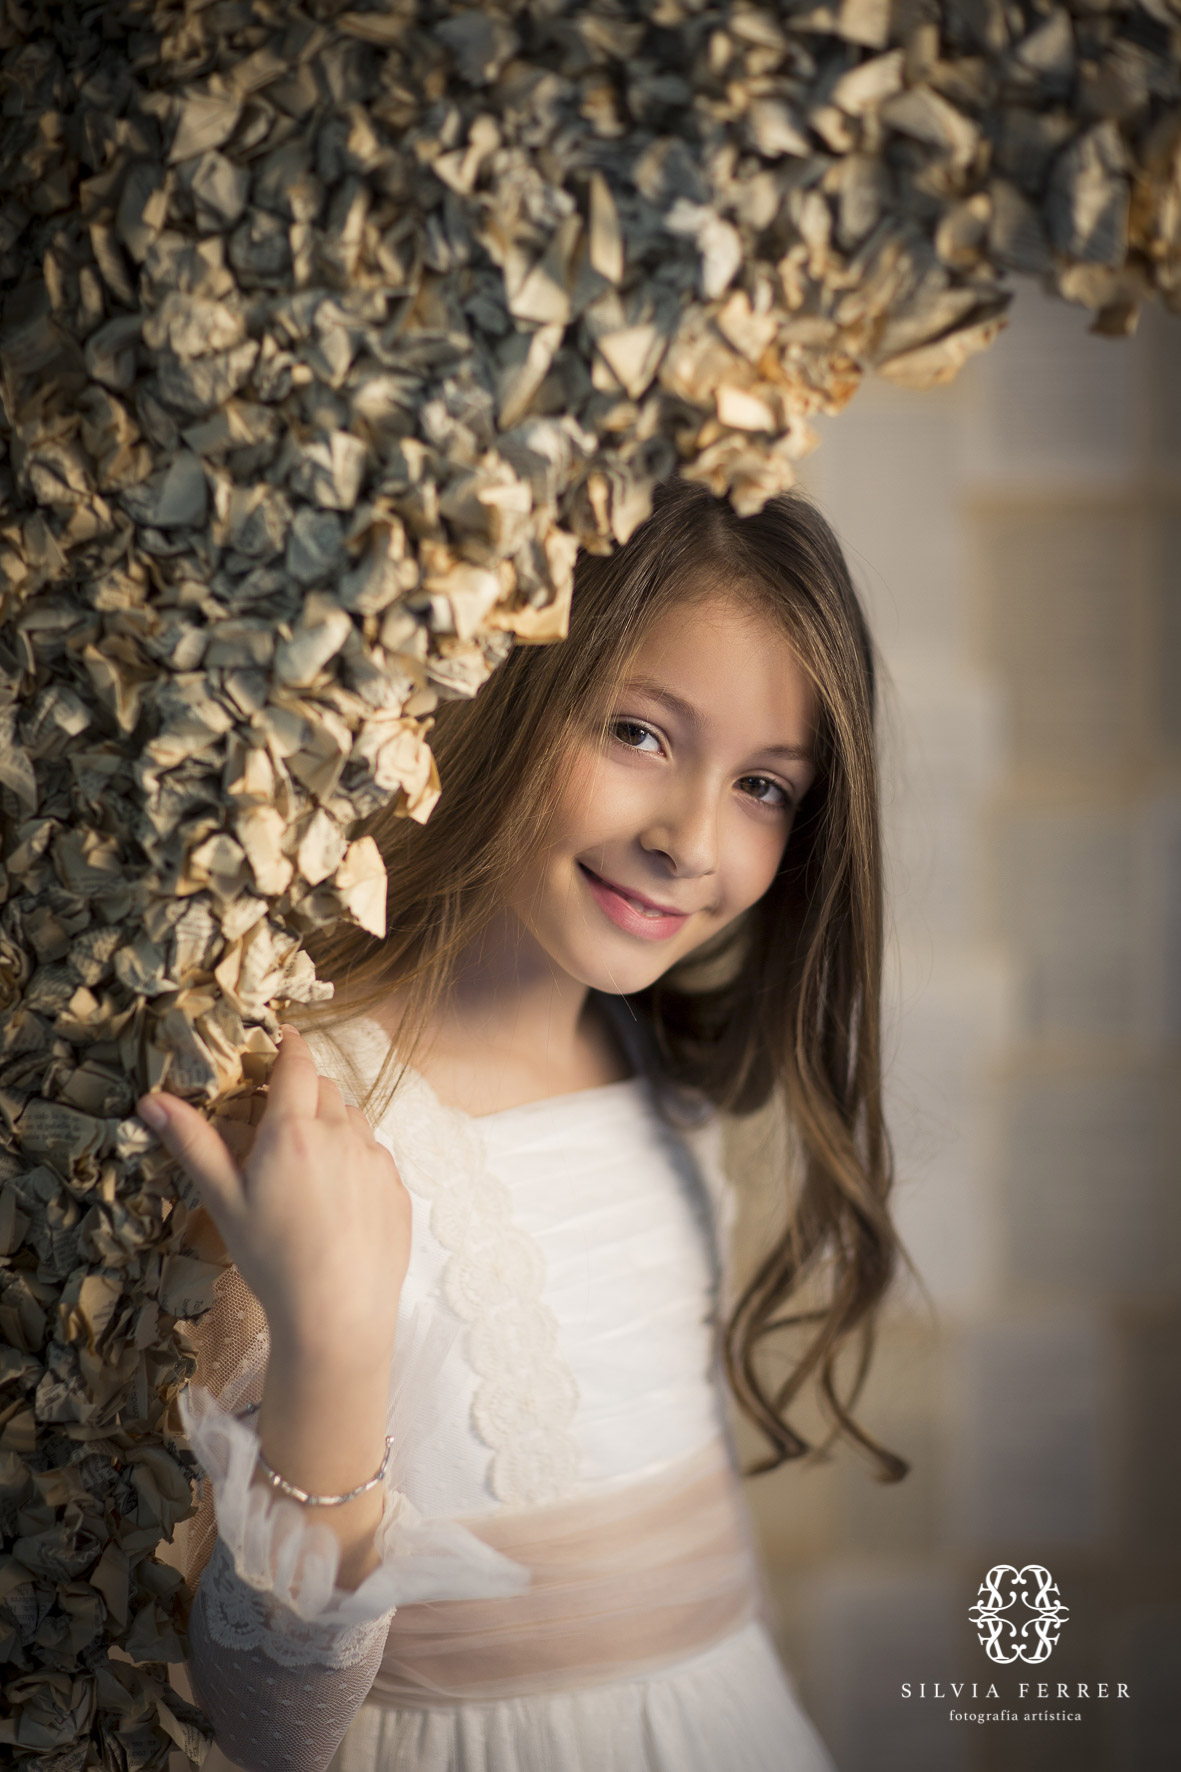 fotos comunion niña murcia bonitas diferentes estudio murcia silvia ferrer